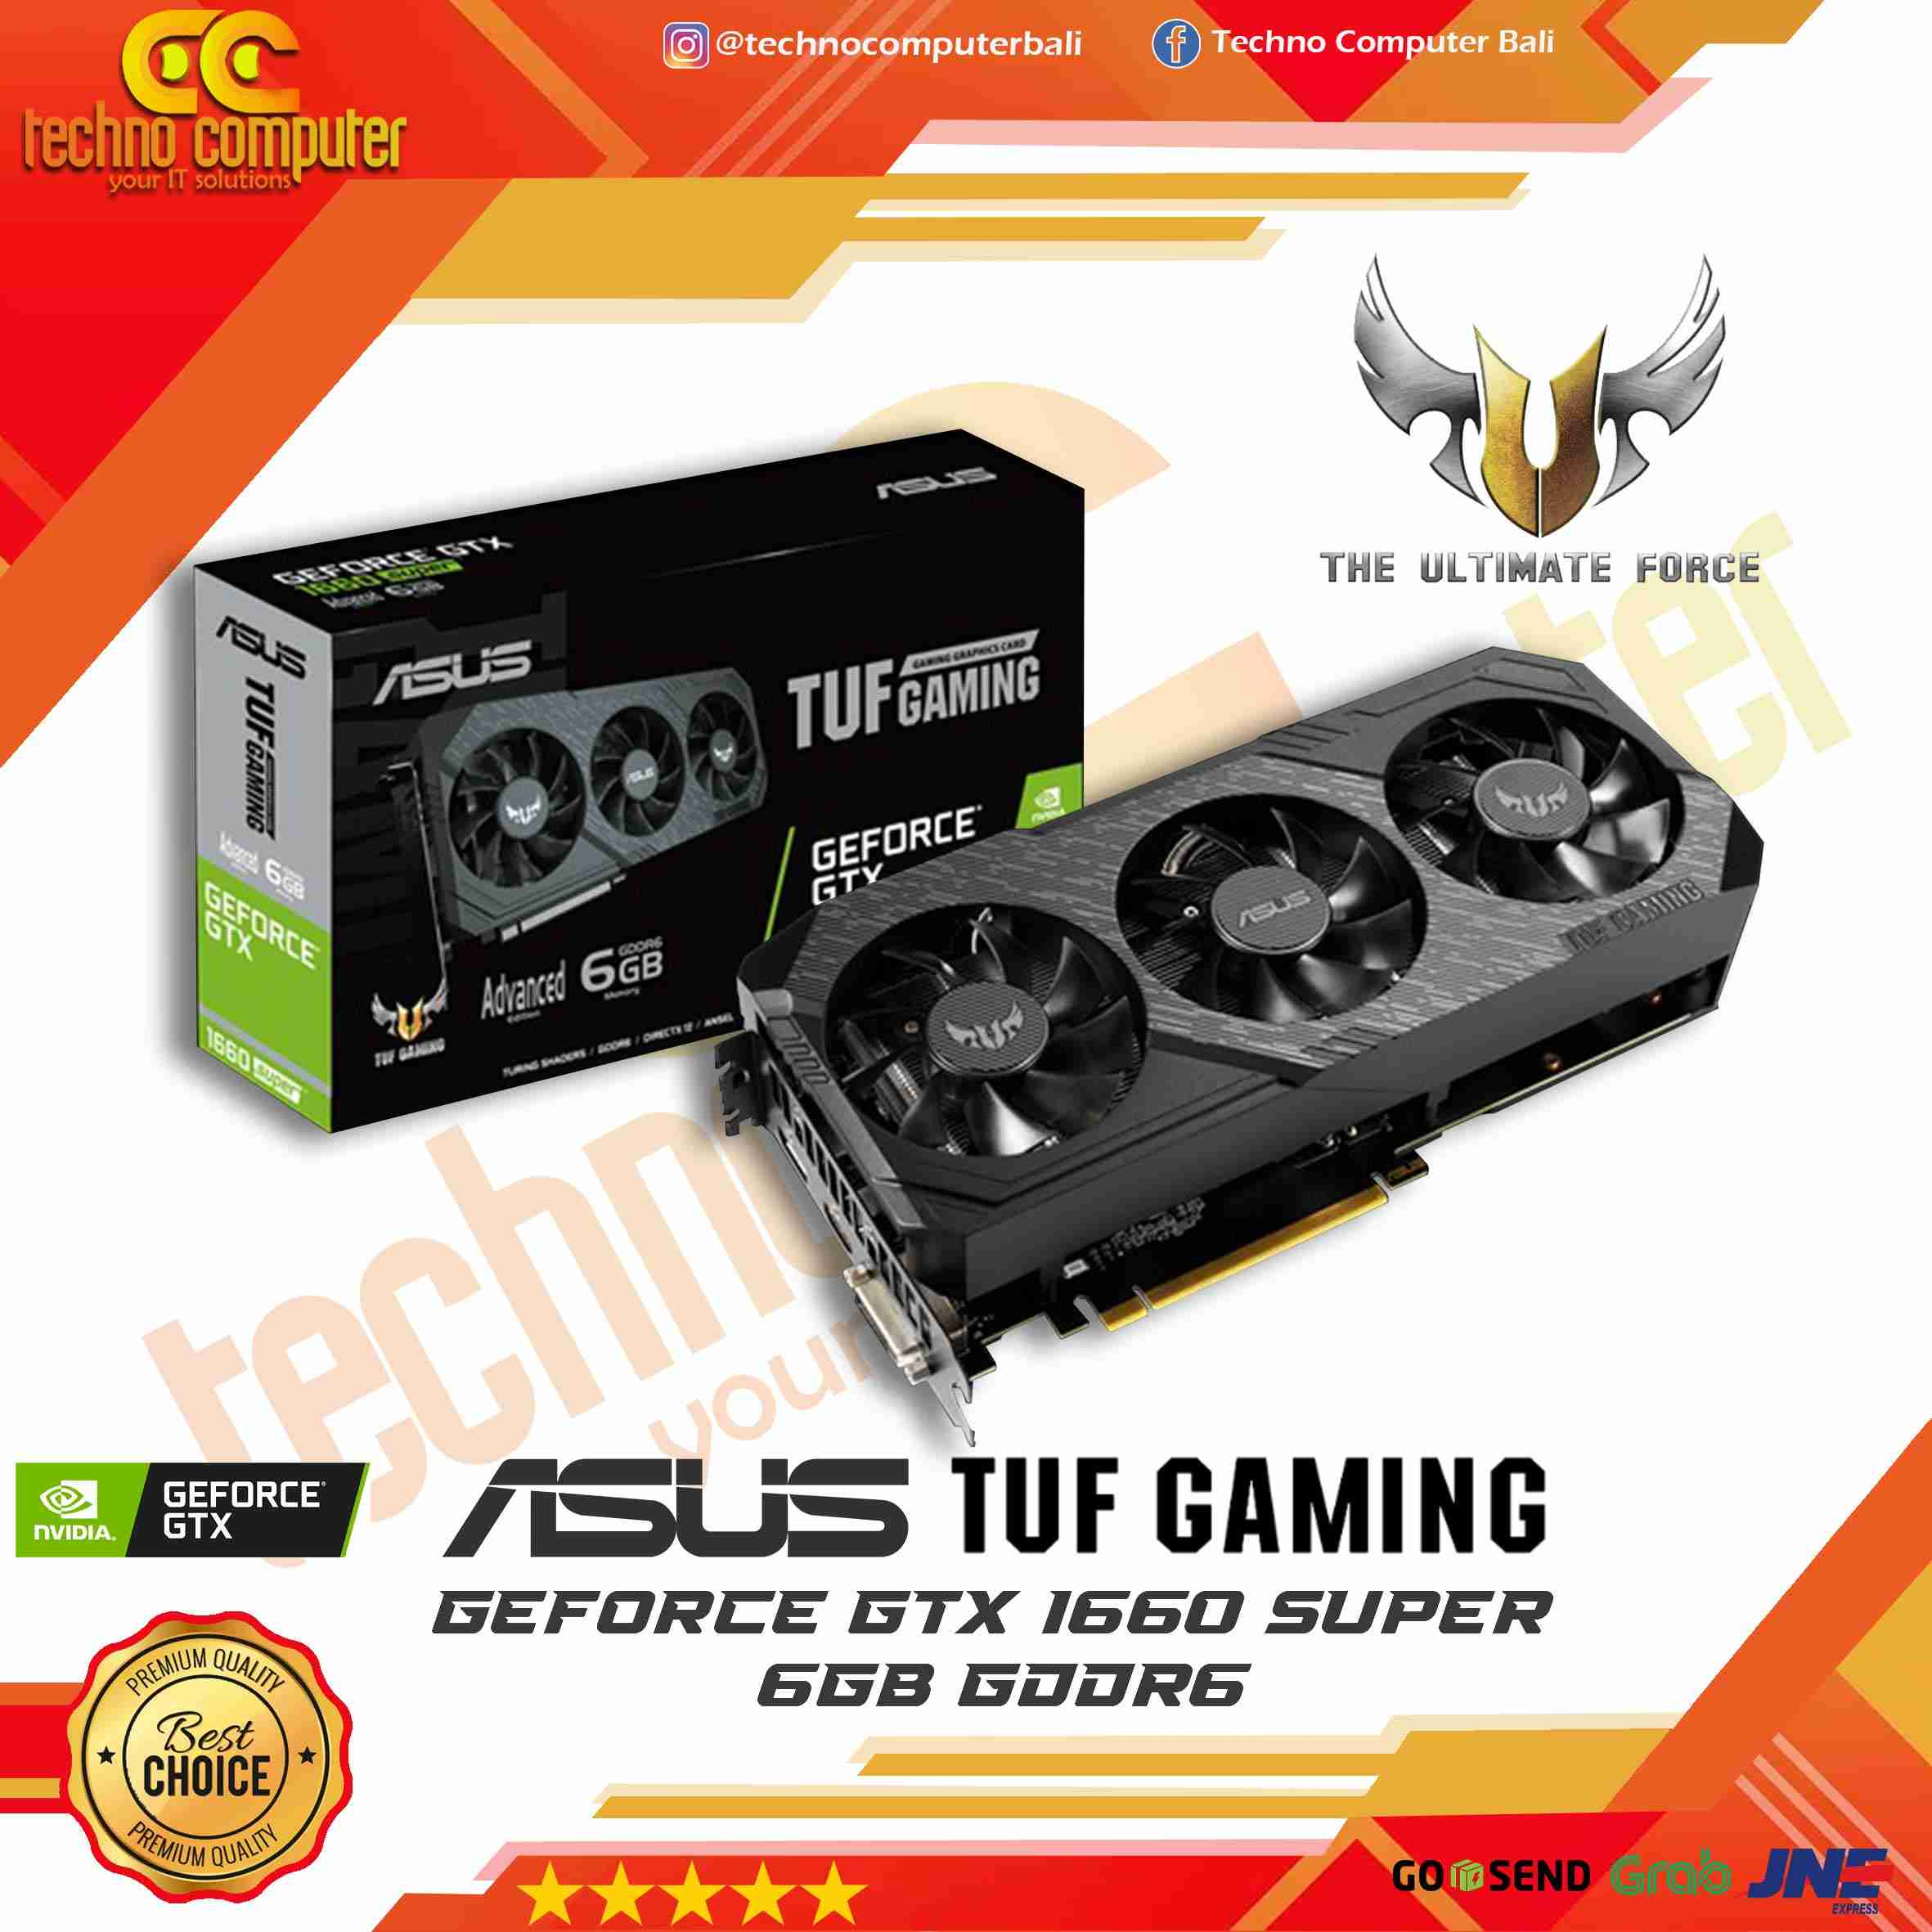 ASUS TUF GAMING GeForce GTX 1660 SUPER Advance 6GB